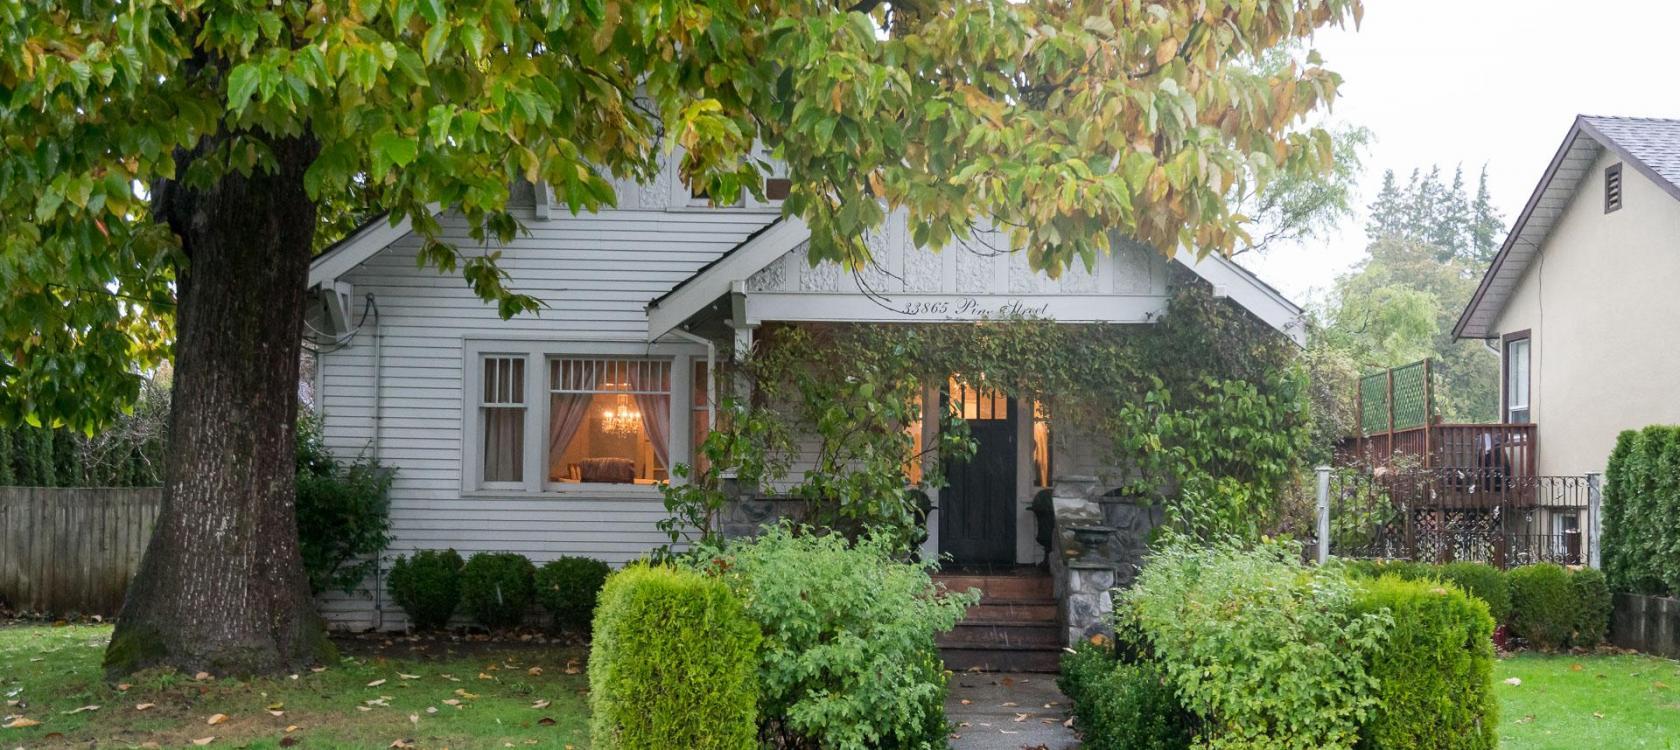 33865 Pine Street, Central Abbotsford, Abbotsford 2